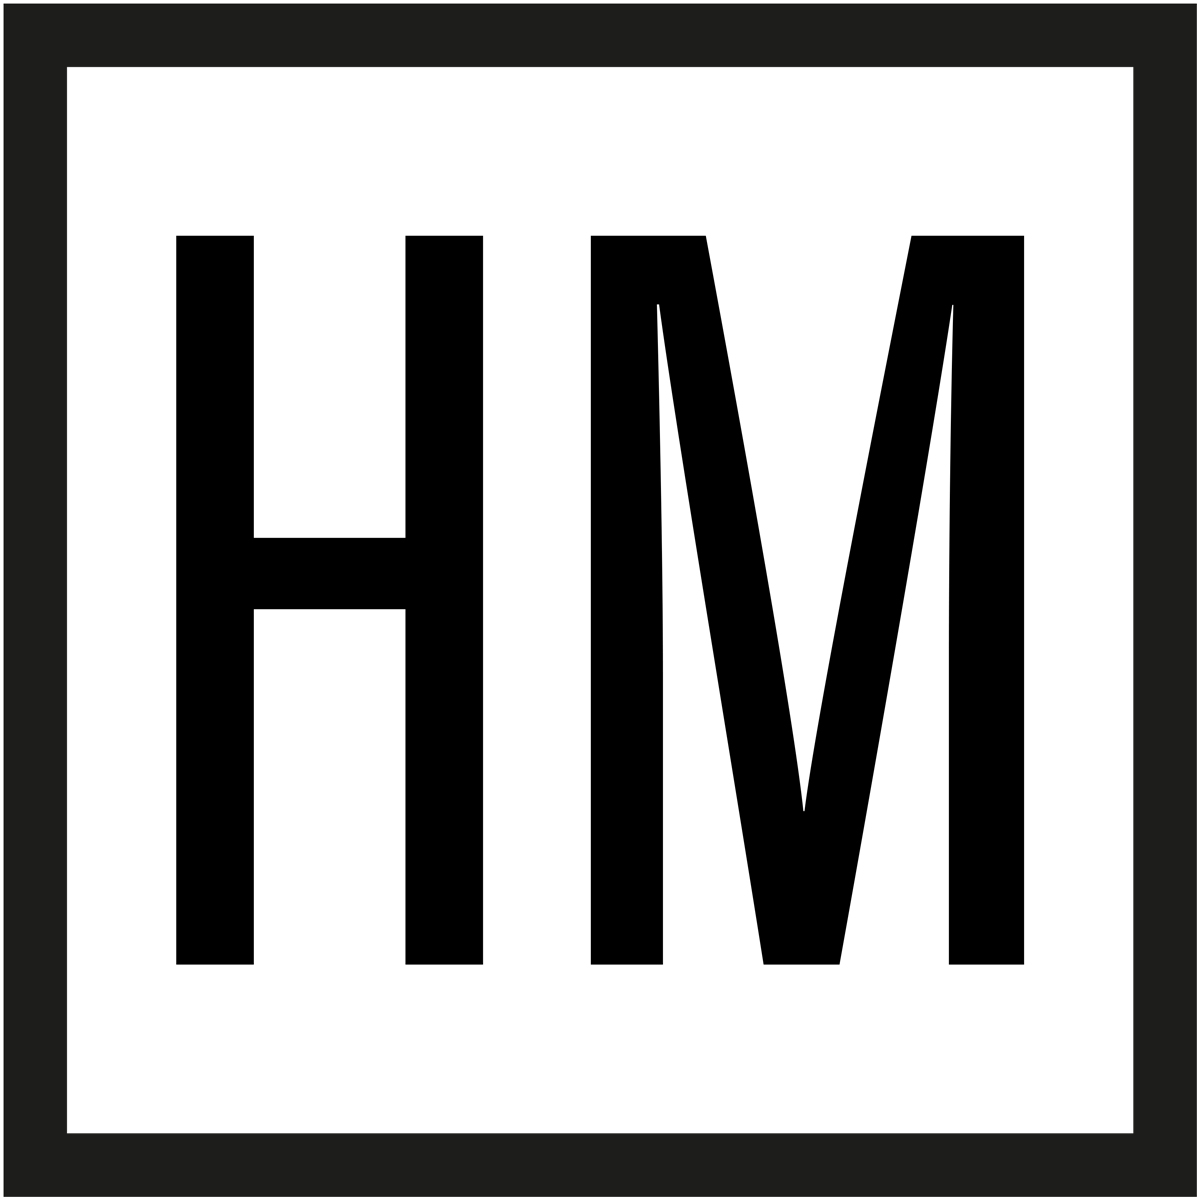 Health Marketing, LLC, a chatbot developer